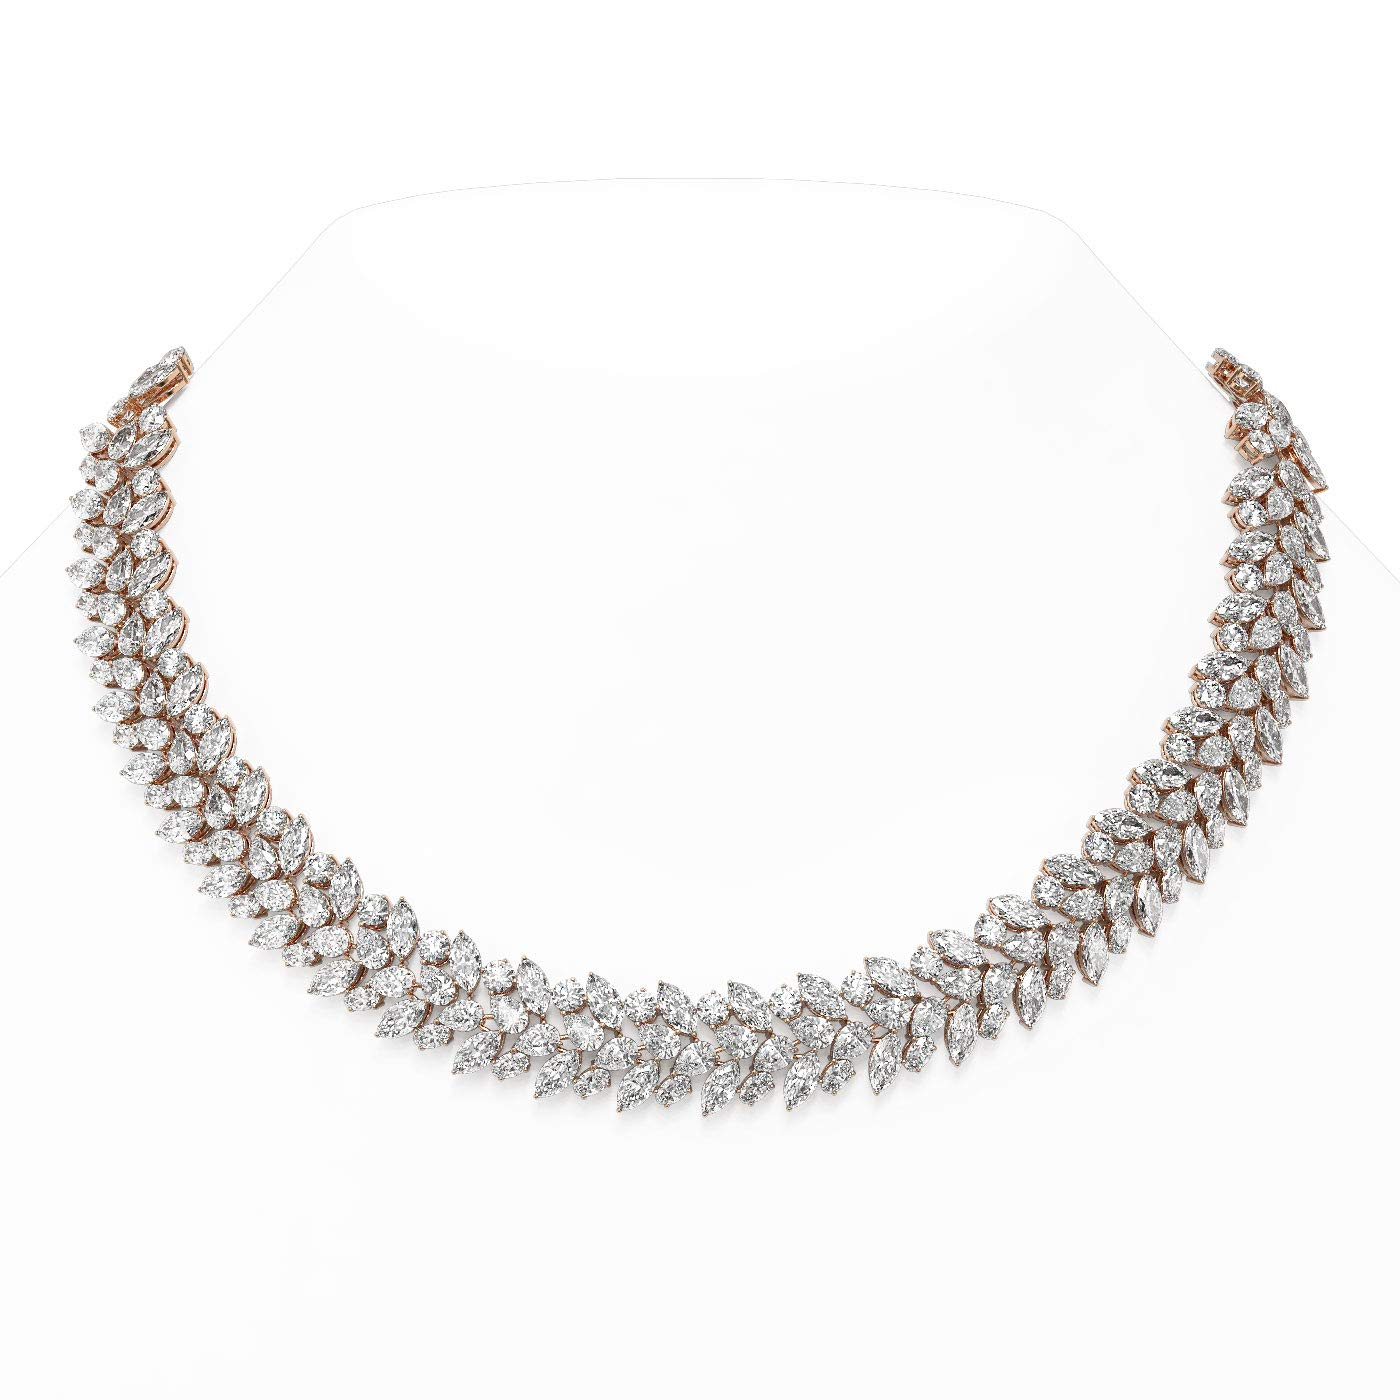 113 Max 77% OFF ctw Mix Cut Designer 18K Diamonds Necklace specialty shop